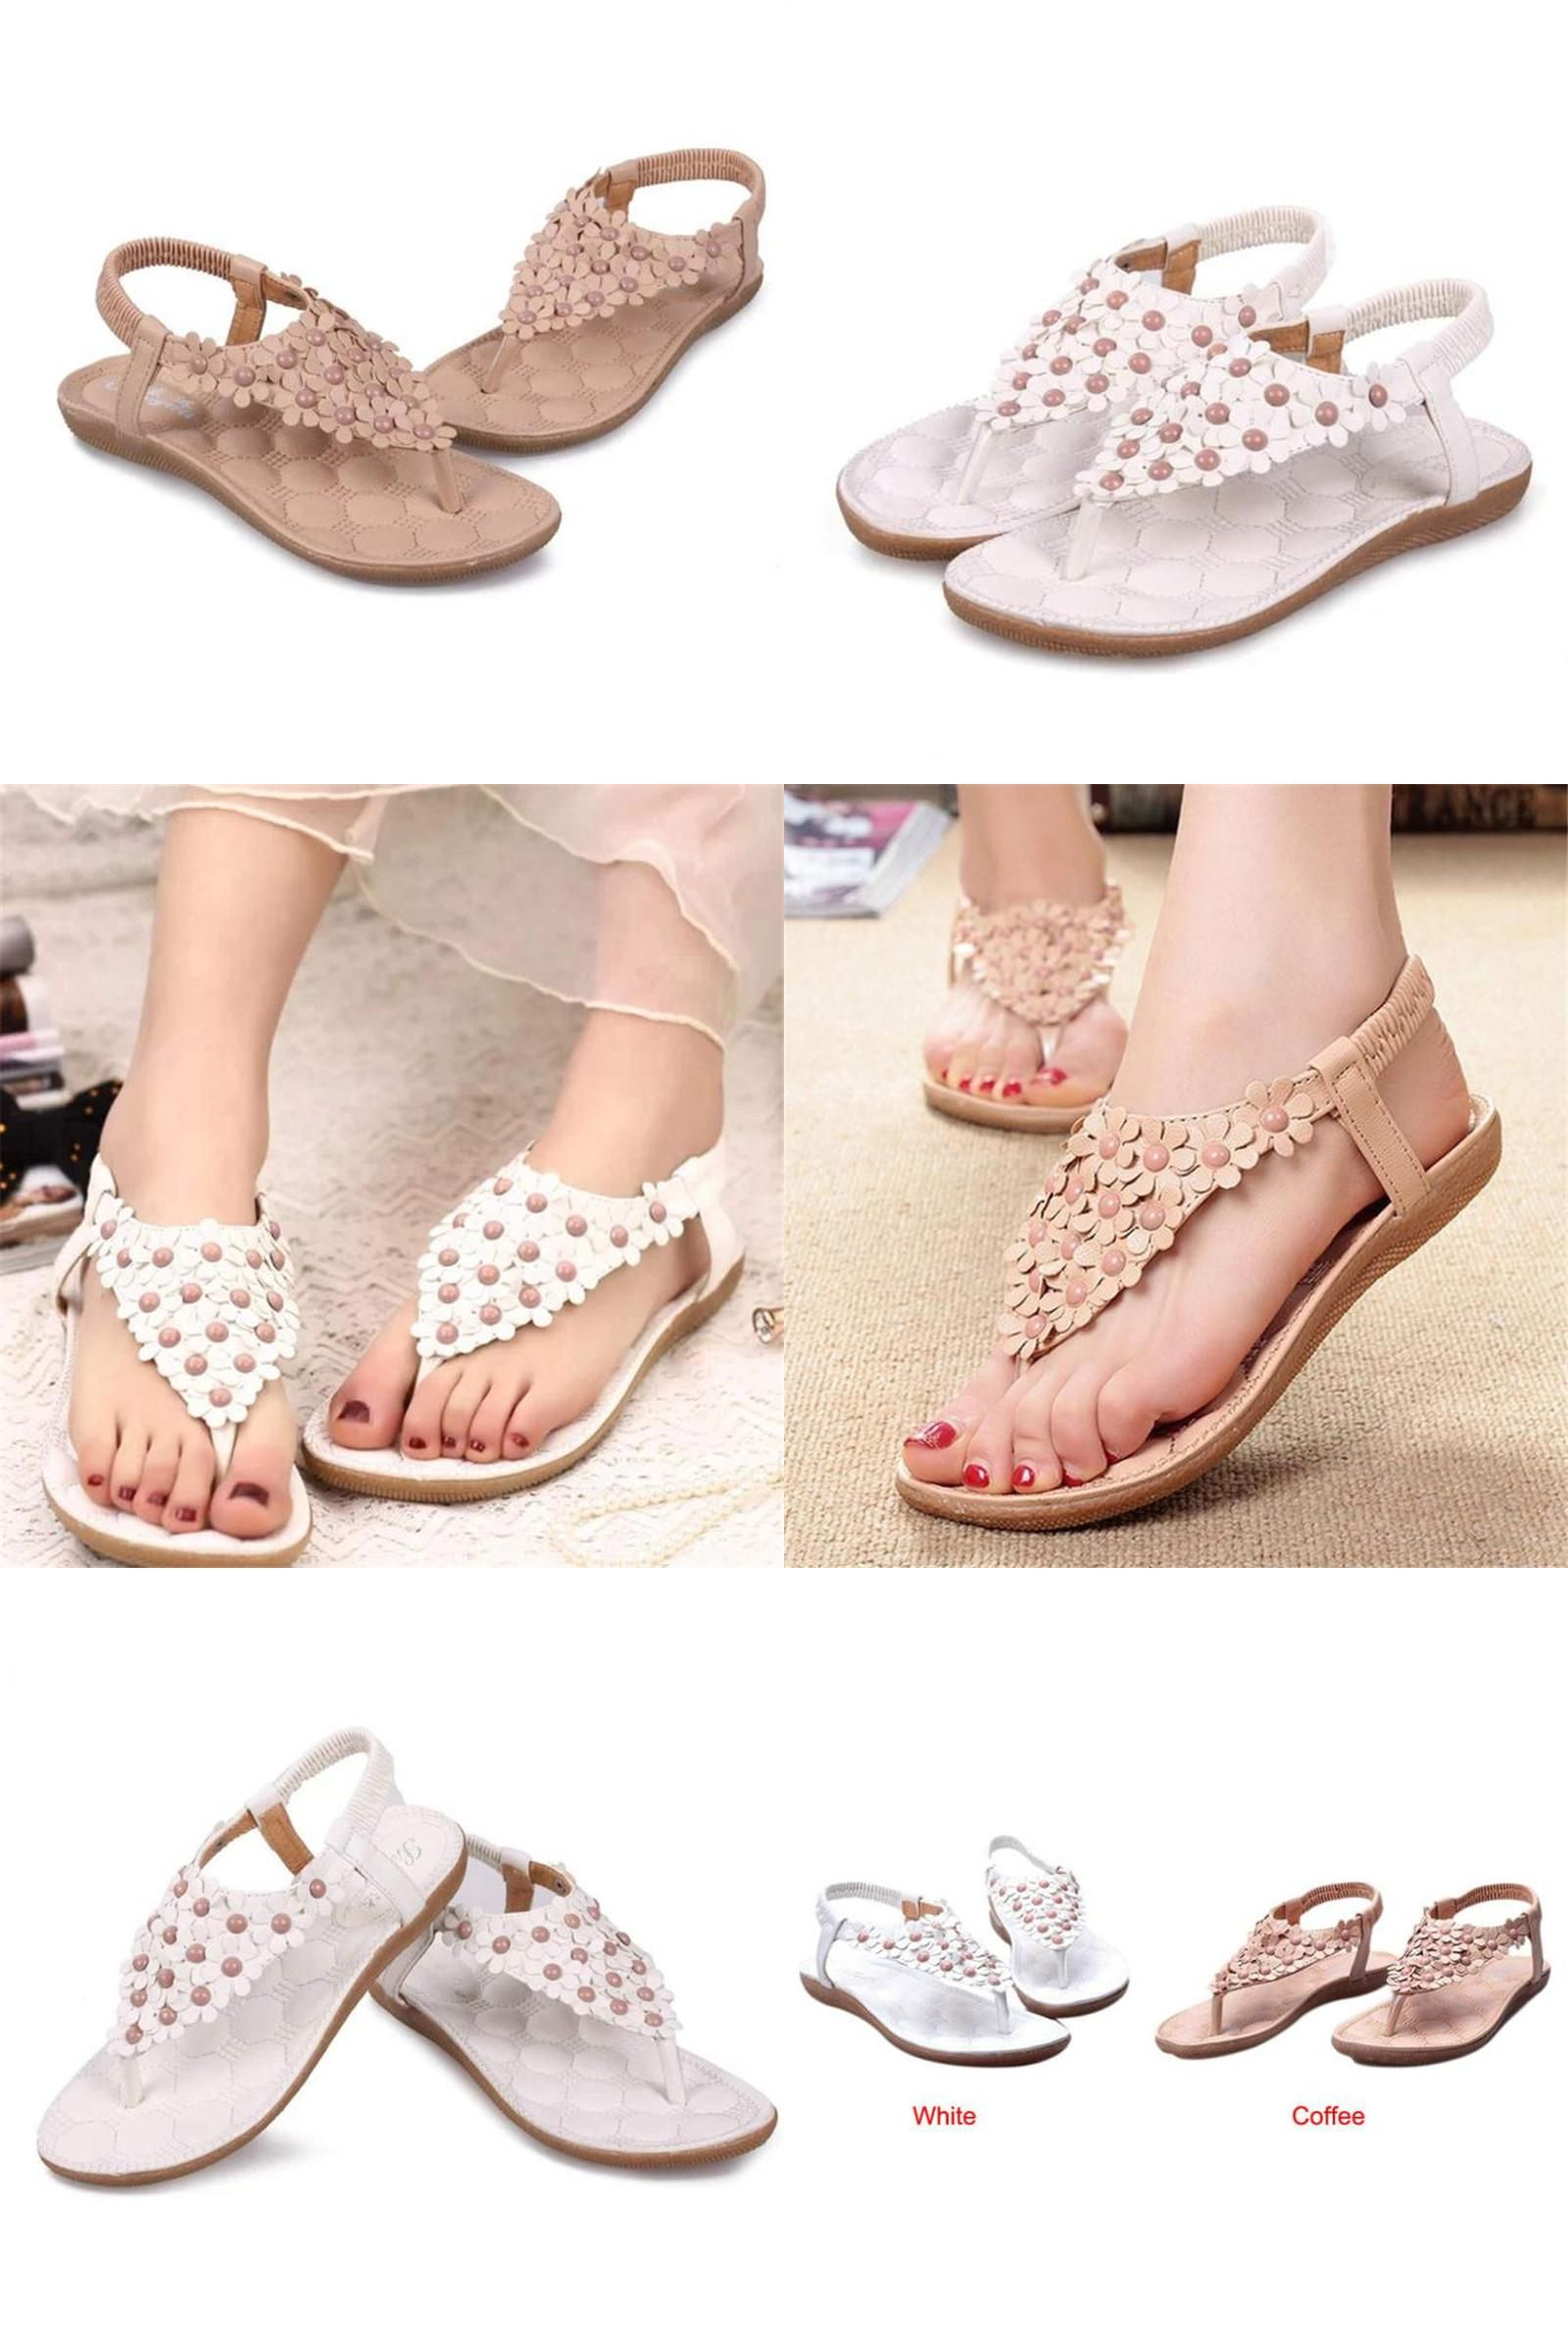 4e2c1433c379c  Visit to Buy  Fashion Women s Sandals Sweet Summer Bohemia Beaded Sandals  Clip Toe Sandals